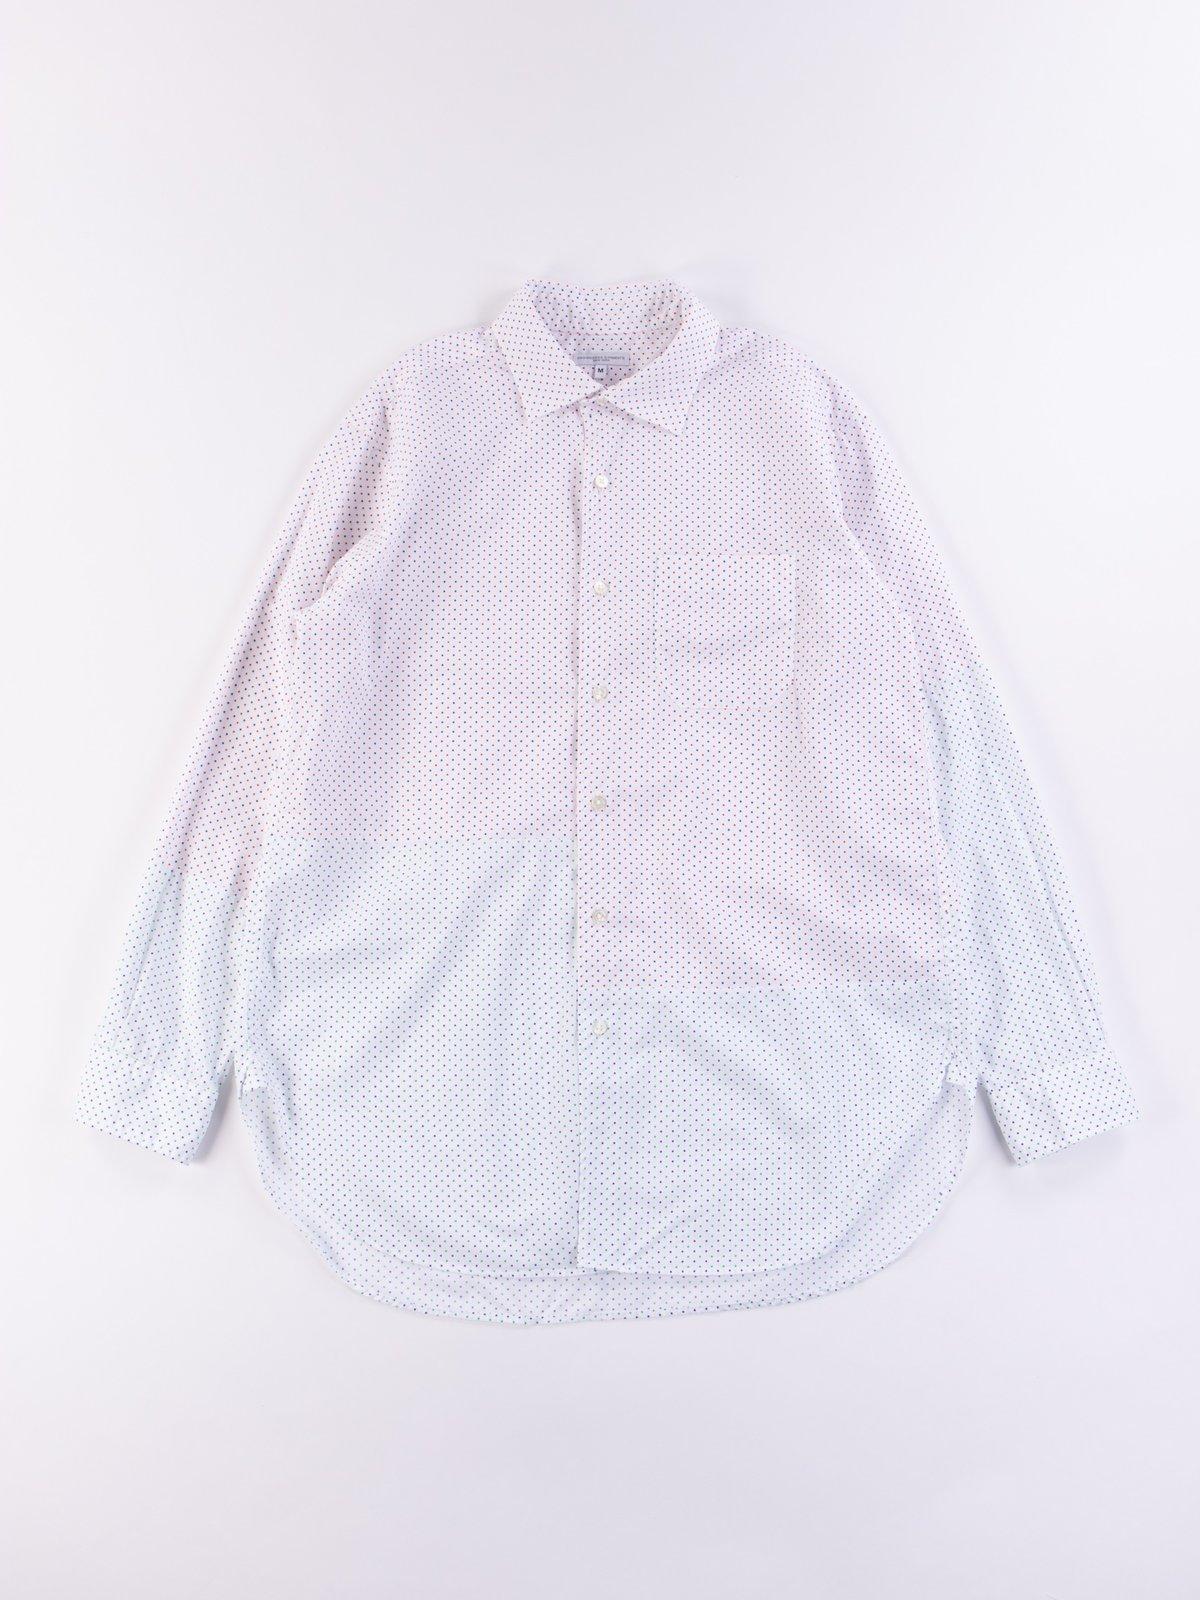 Red/Navy Small Polka Dot Spread Collar Shirt - Image 1